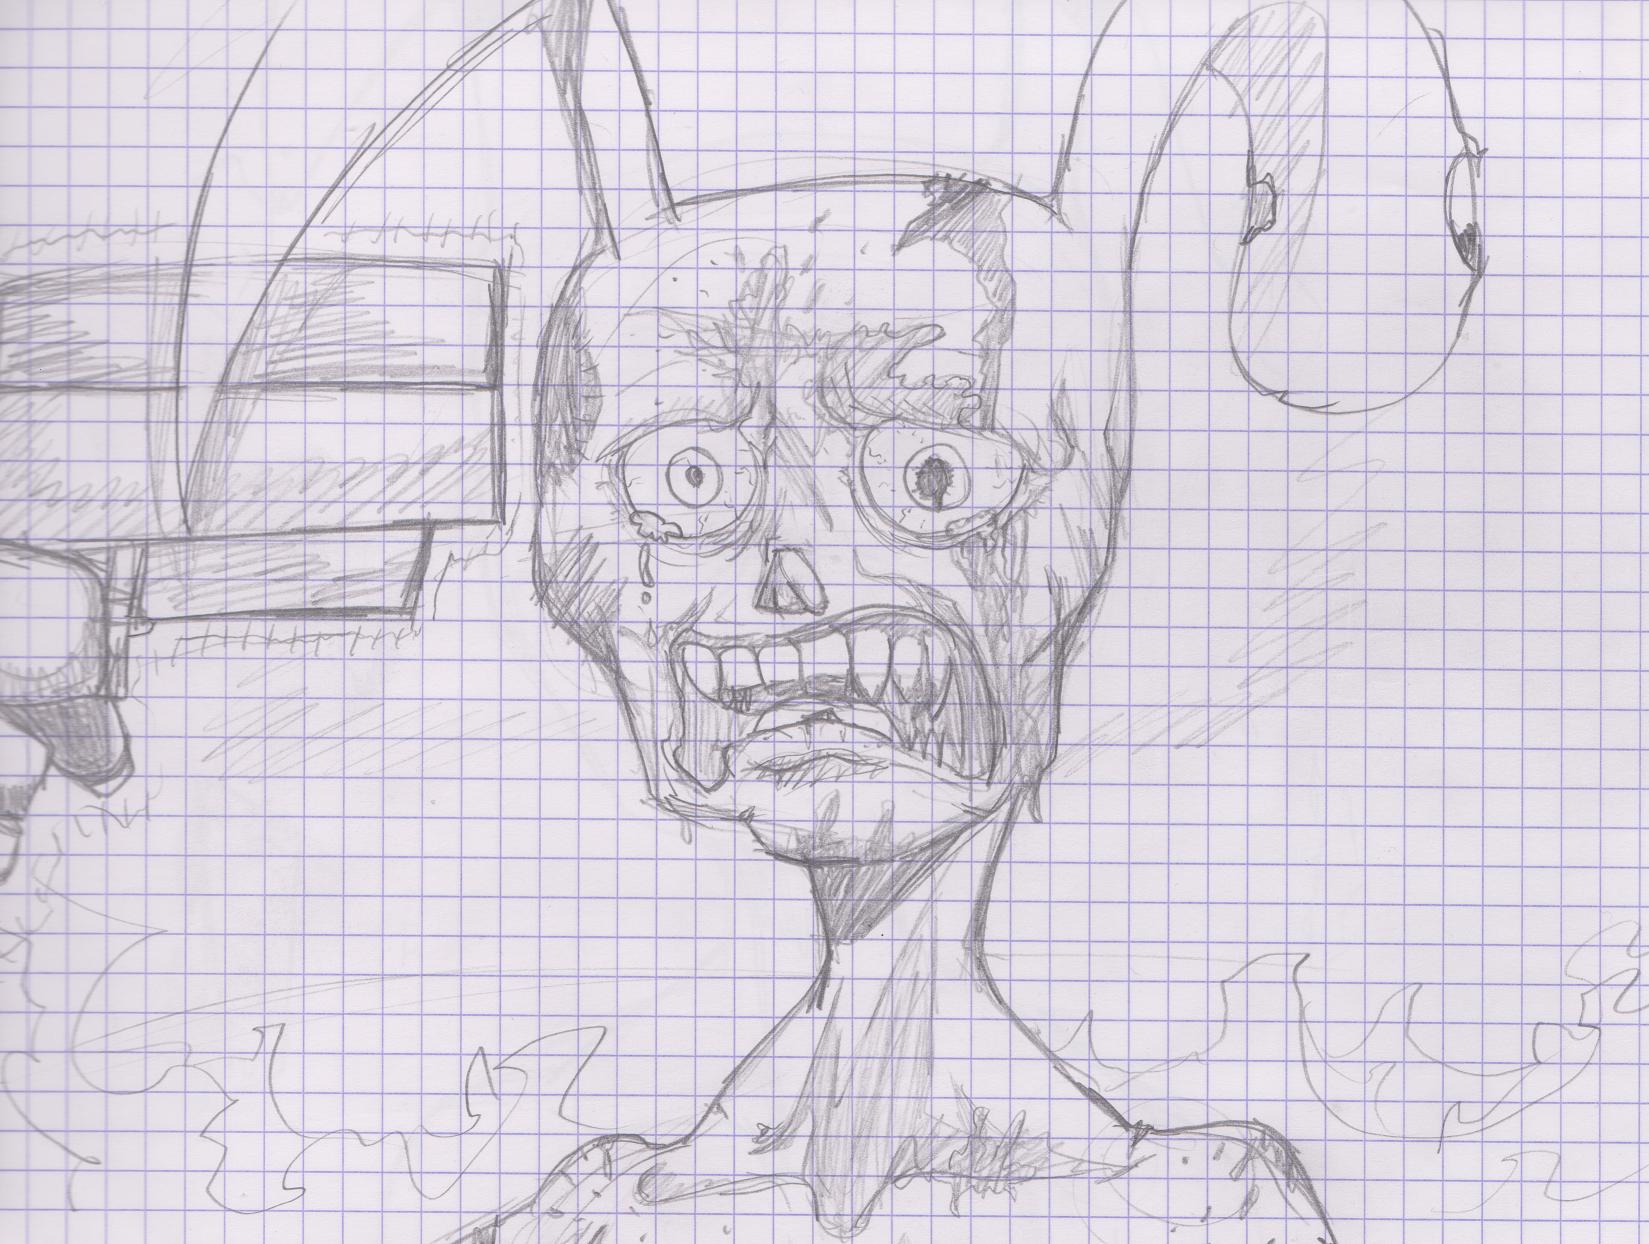 SH sketchbook page 62